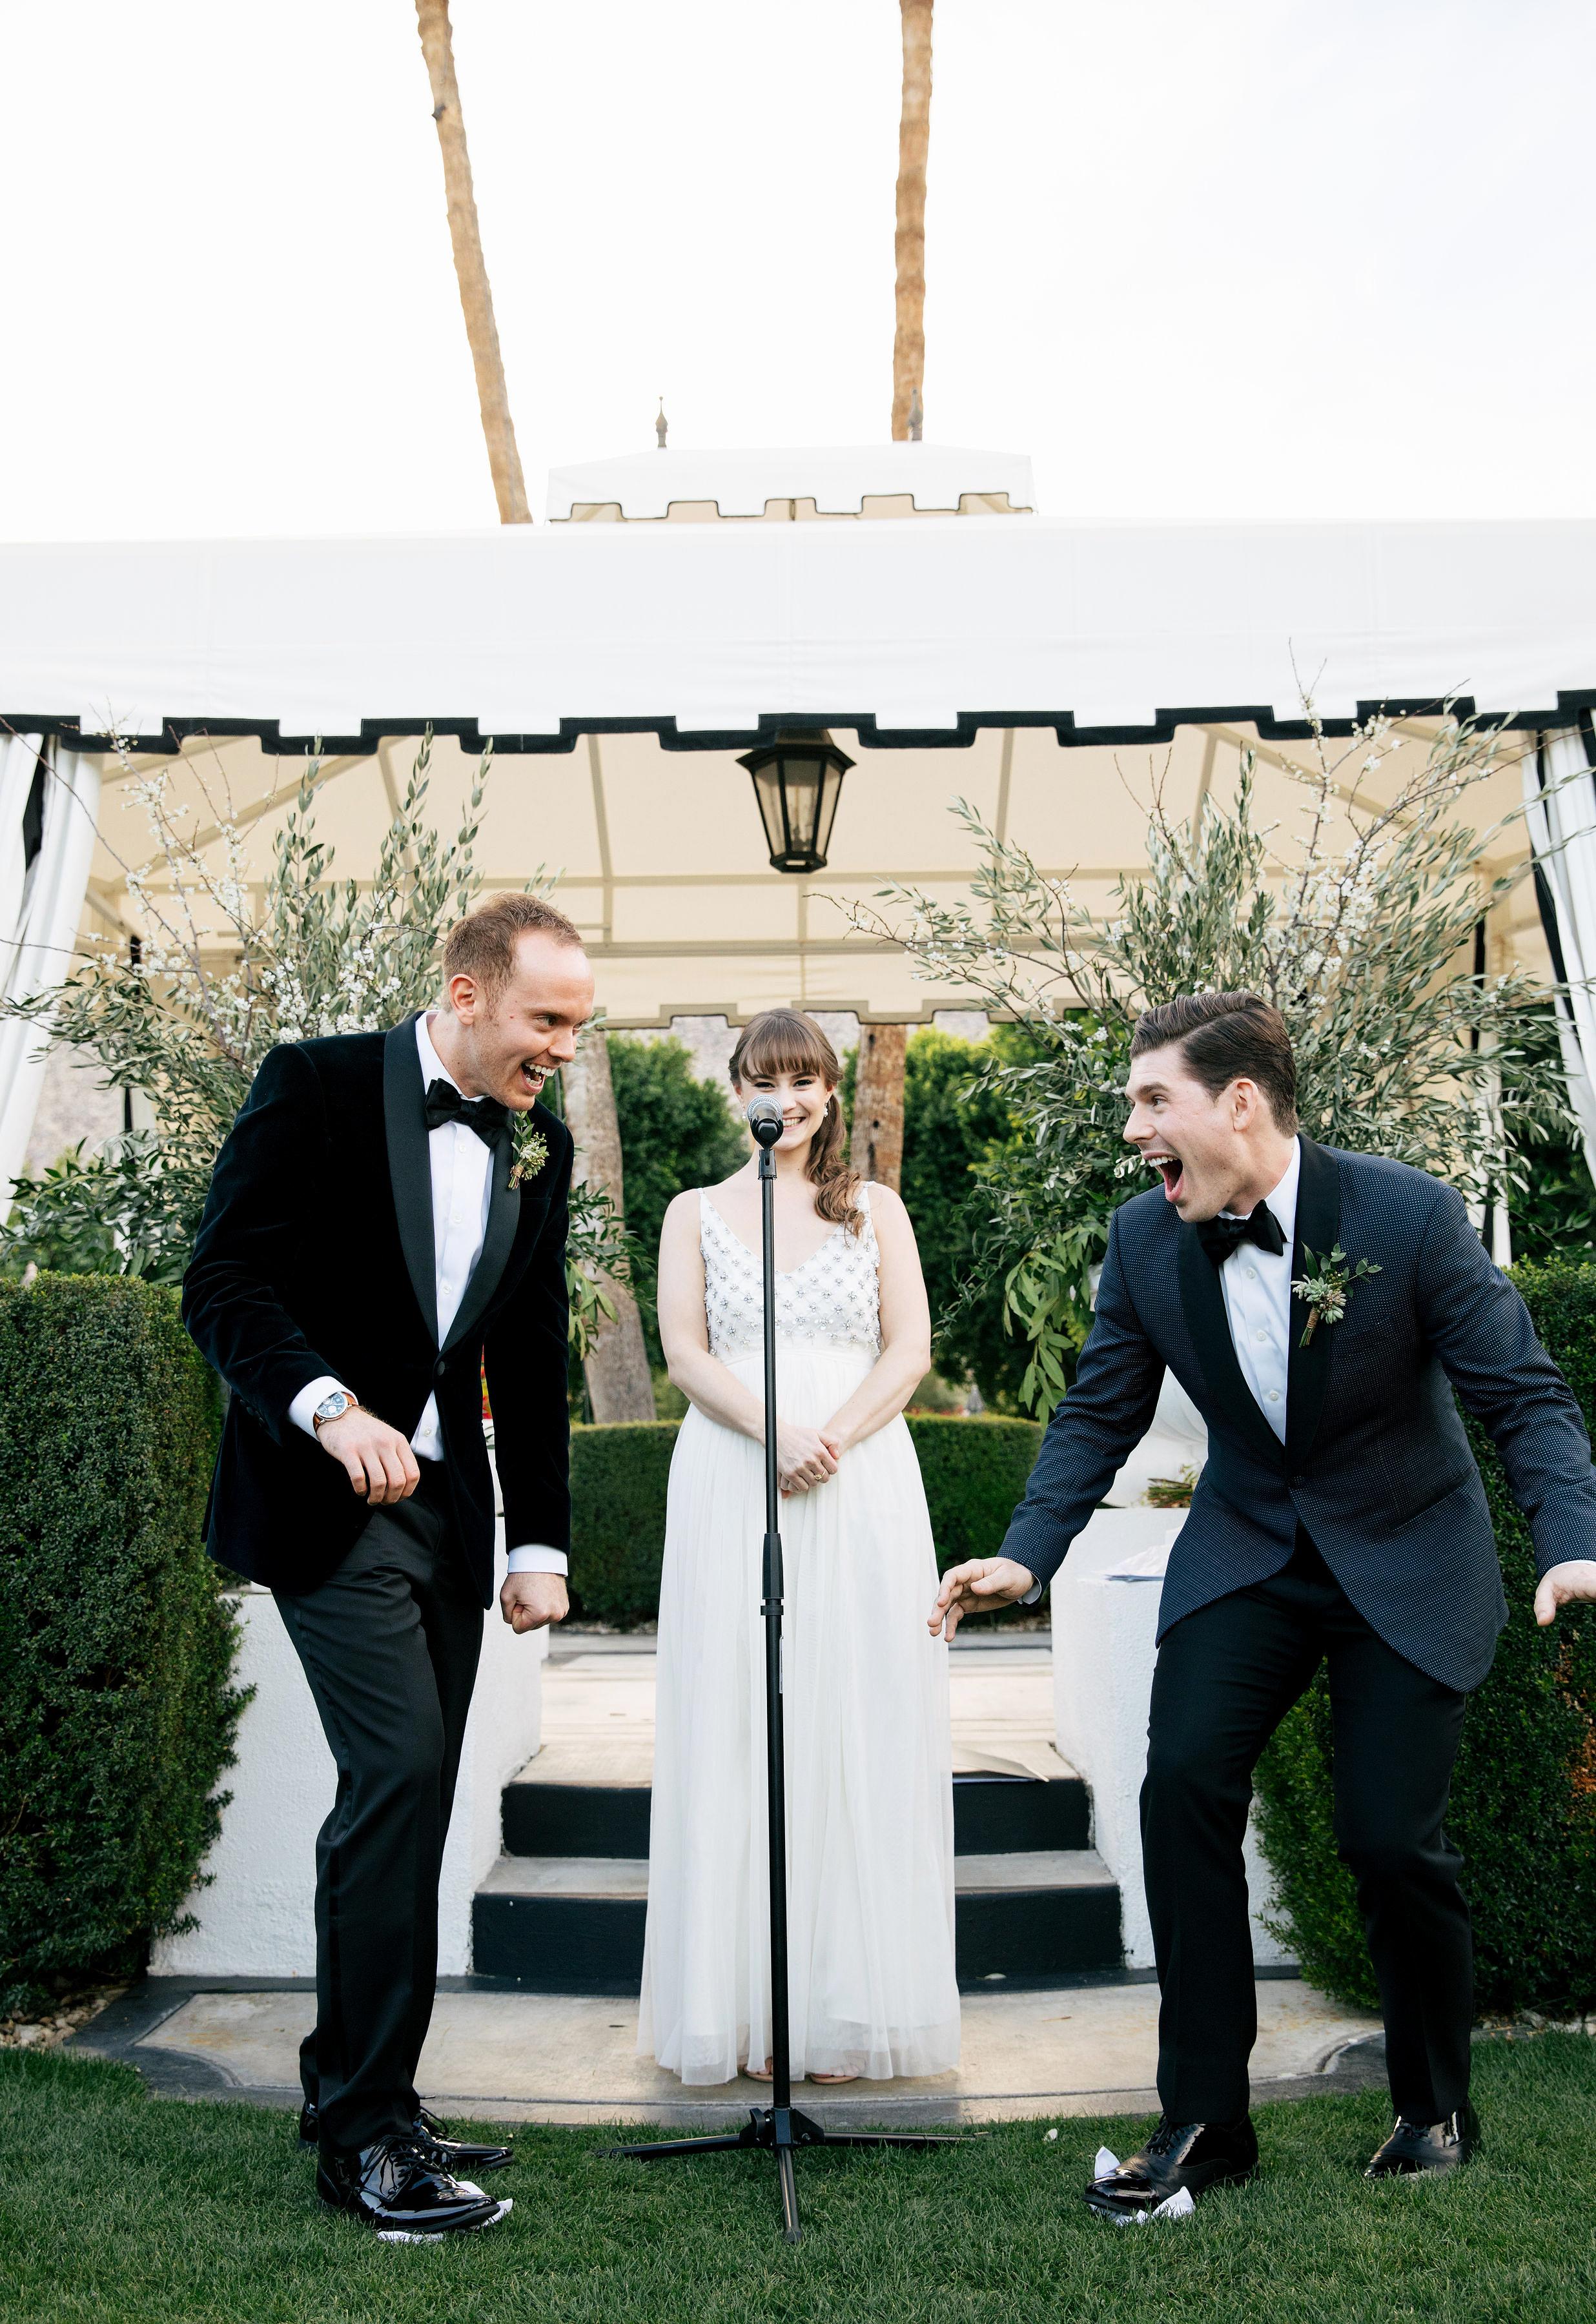 michael thomas wedding ceremony glass